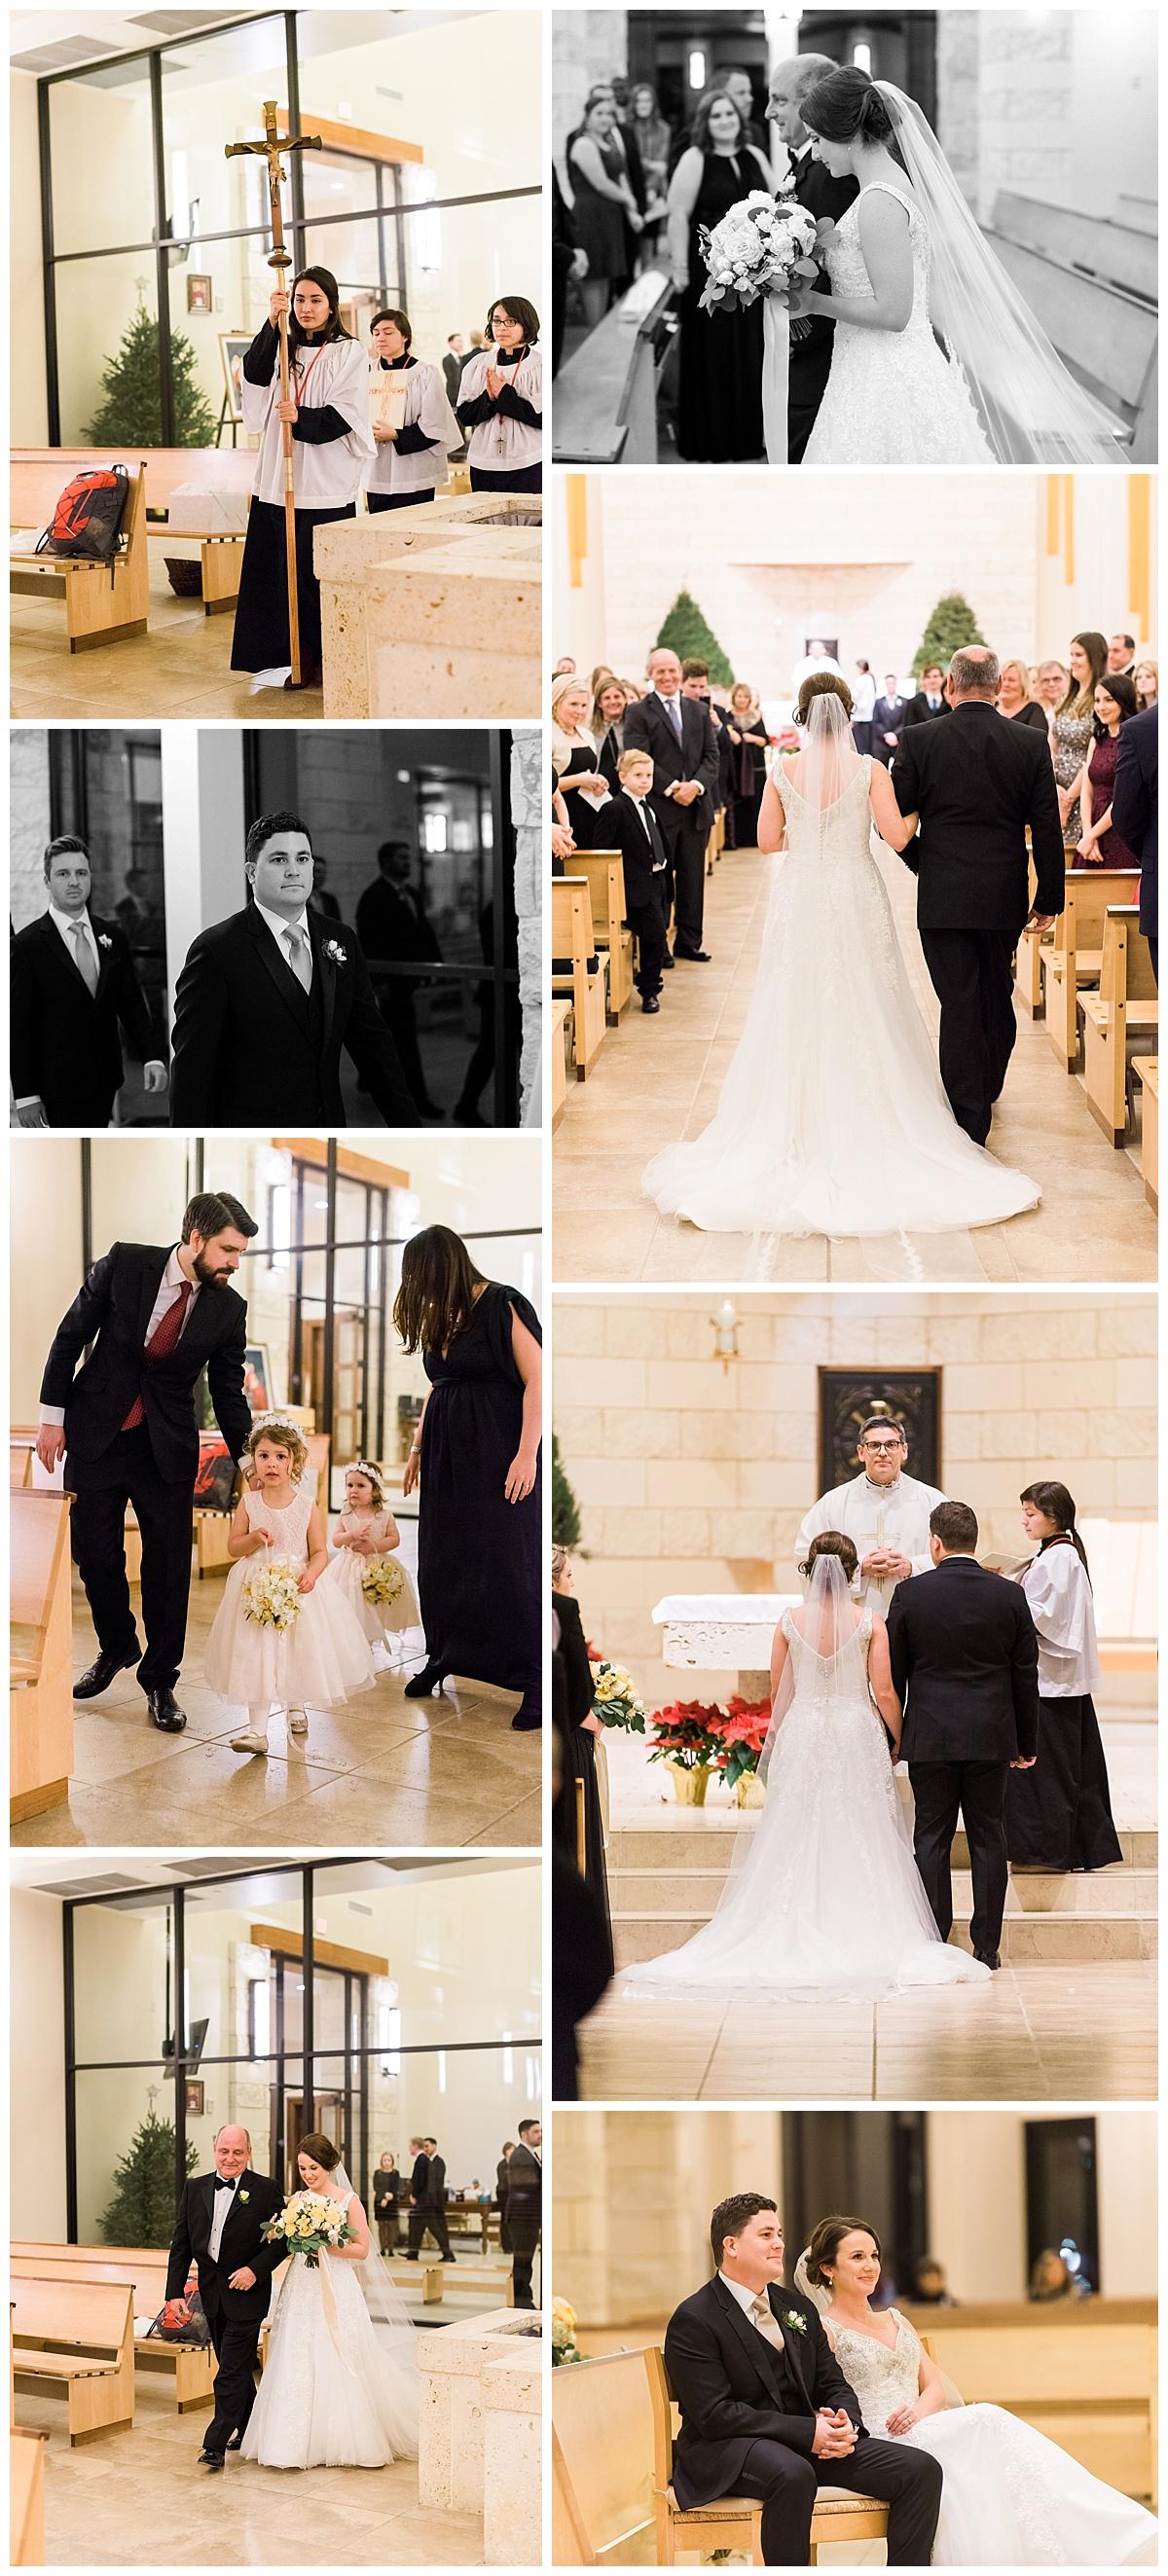 the-cotton-mill-wedding-ar-photography-16.jpg